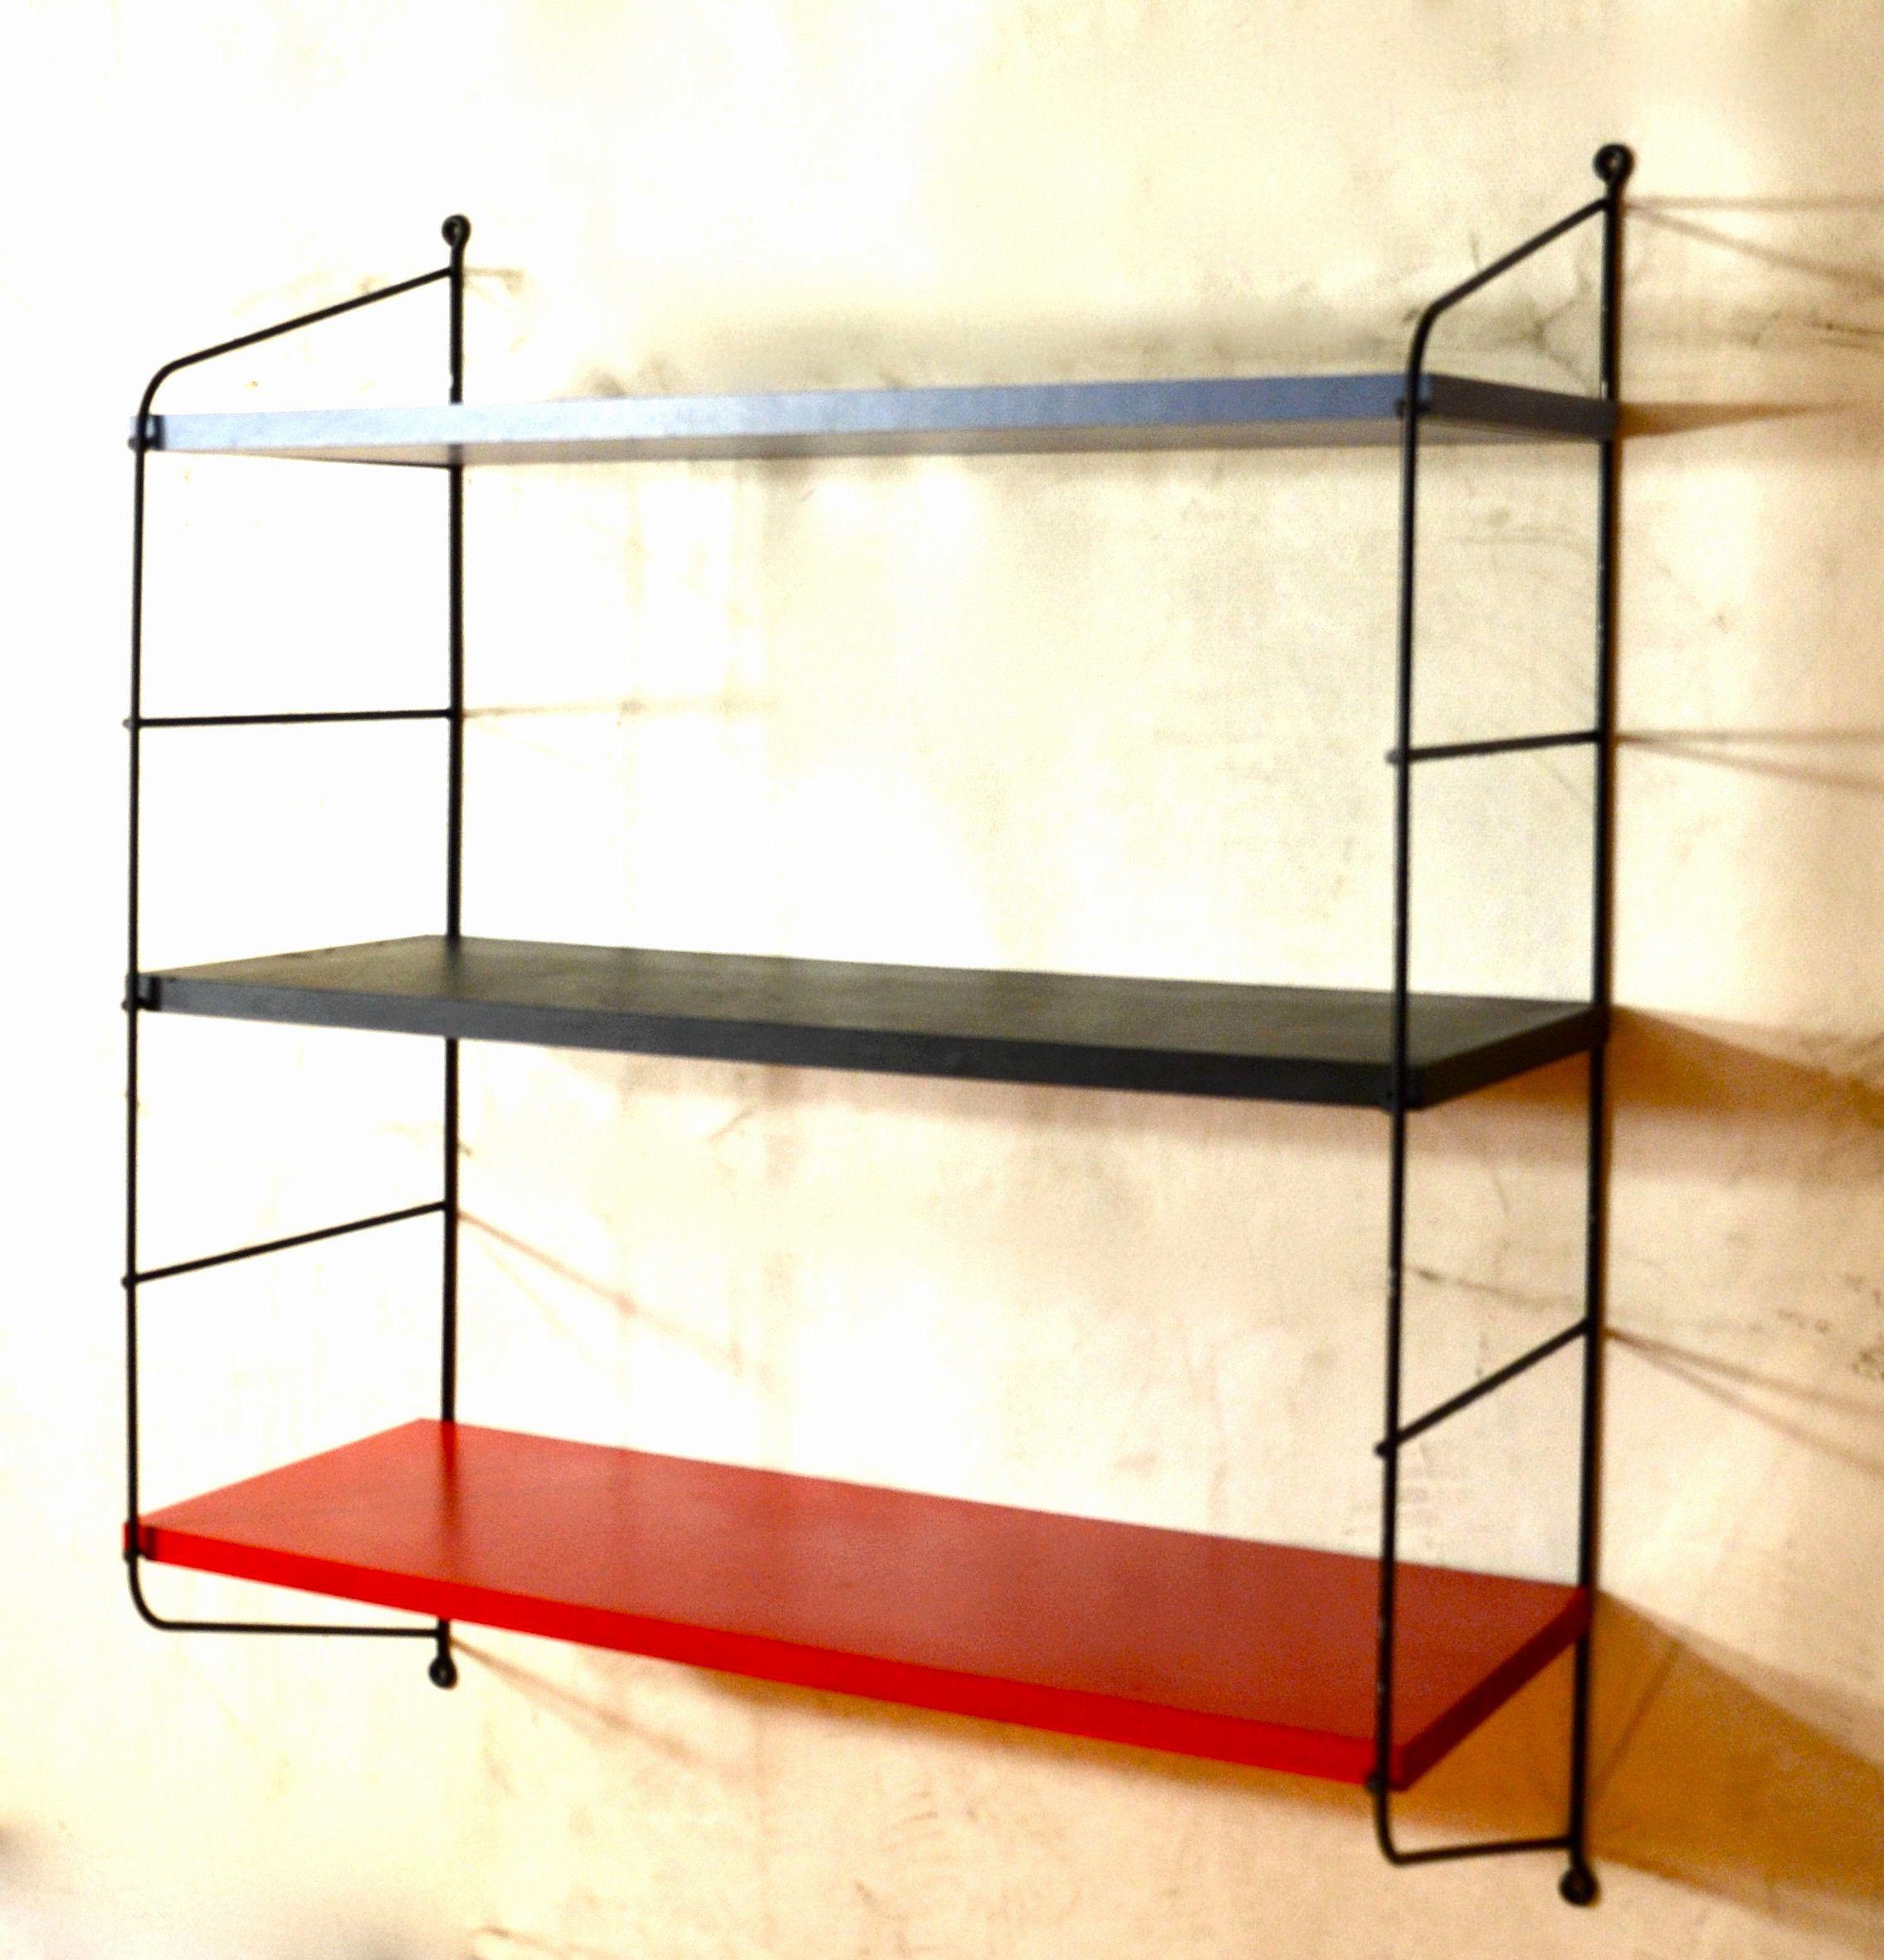 30 Luxe Etagere Chambre Froide Recommandations Etagere Chambre Etagere Chambre Ado Fille Etagere Chambre Ado Leroy M Shelves Home Decor Decor